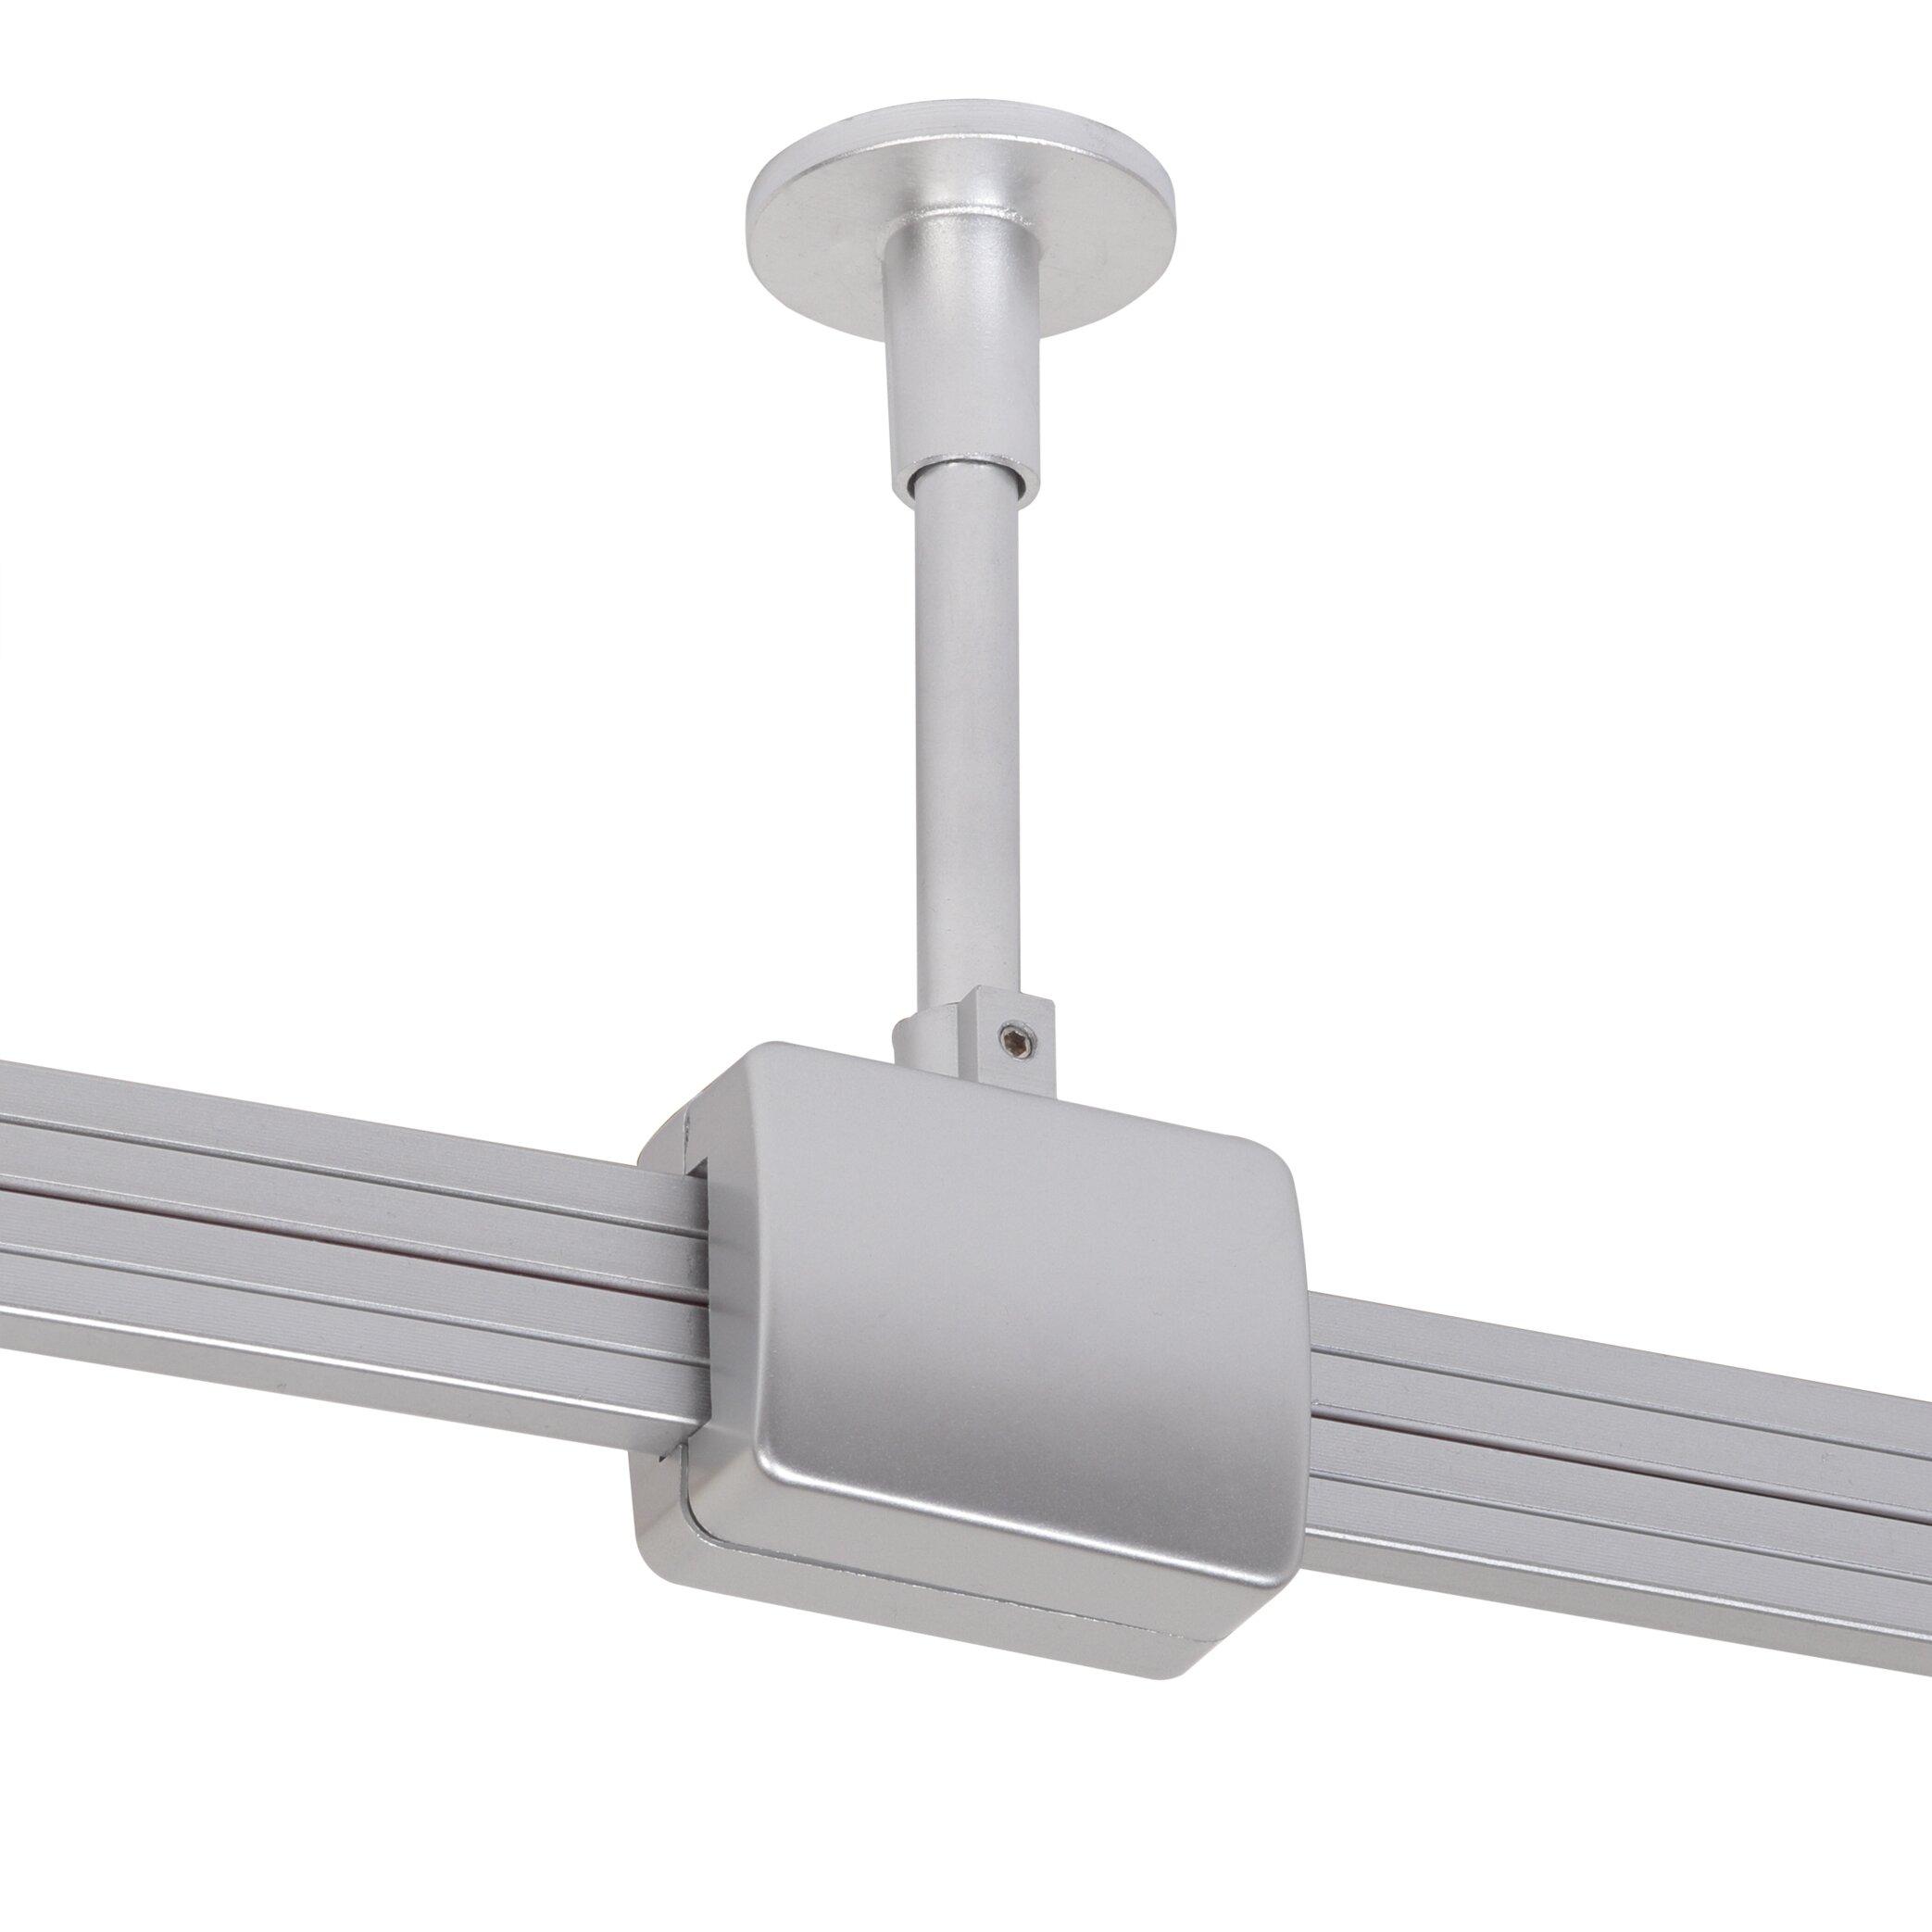 jayson 6 light flex full track lighting kit by globe electric company. Black Bedroom Furniture Sets. Home Design Ideas